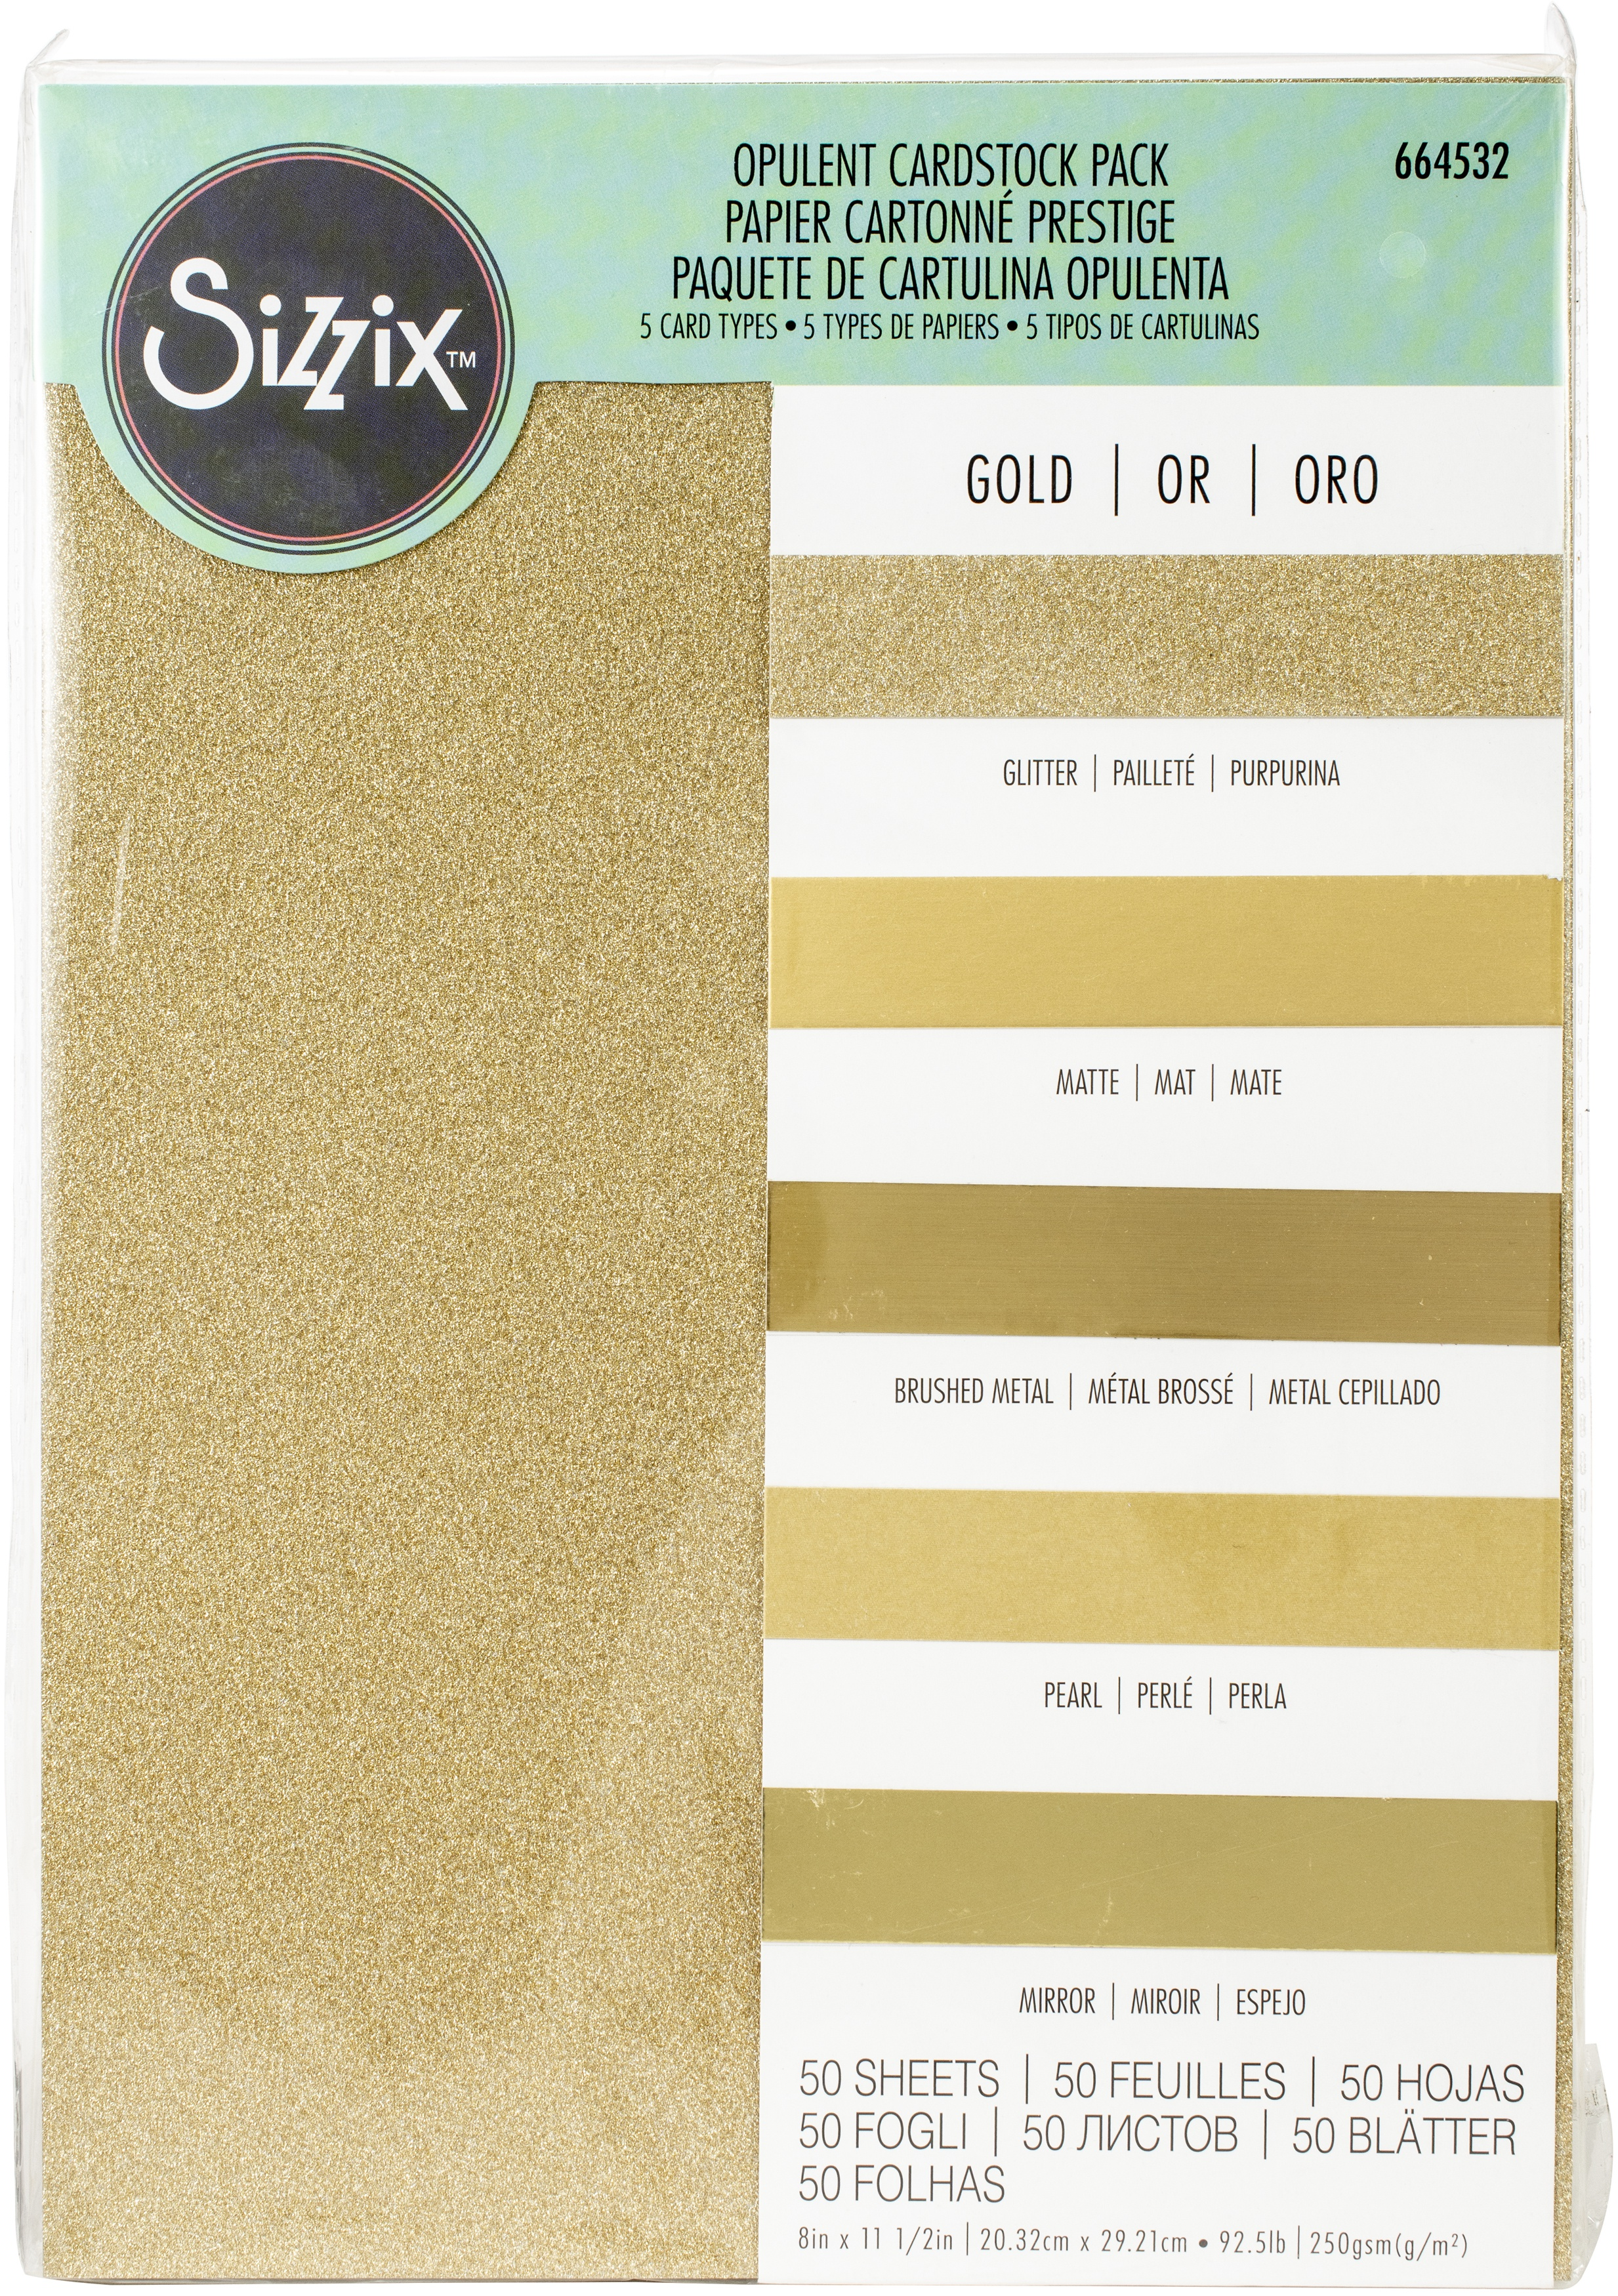 Sizzix Surfacez Opulent Cardstock Pack 8X11.5 50/Pkg-Gold